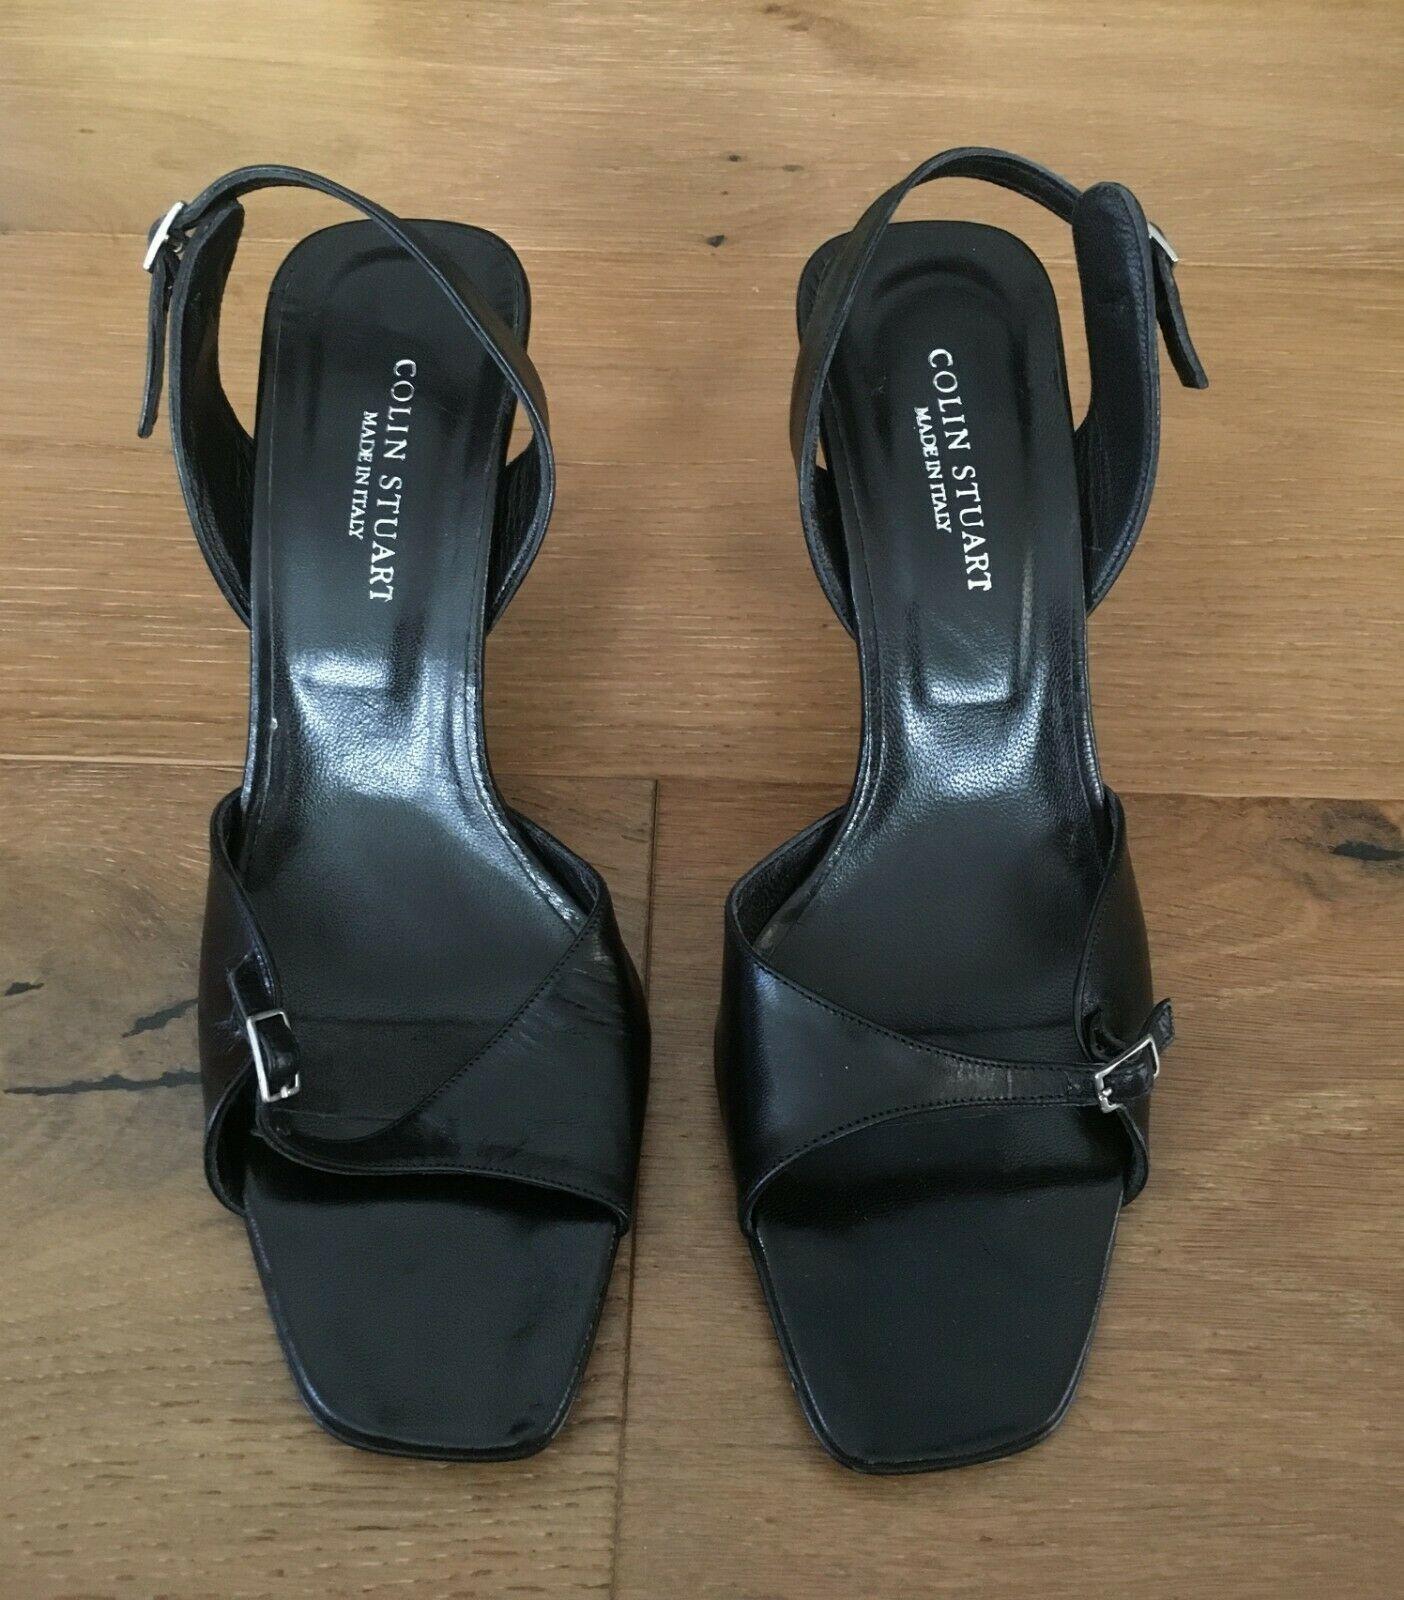 Colin Stuart Black Leather High Heel